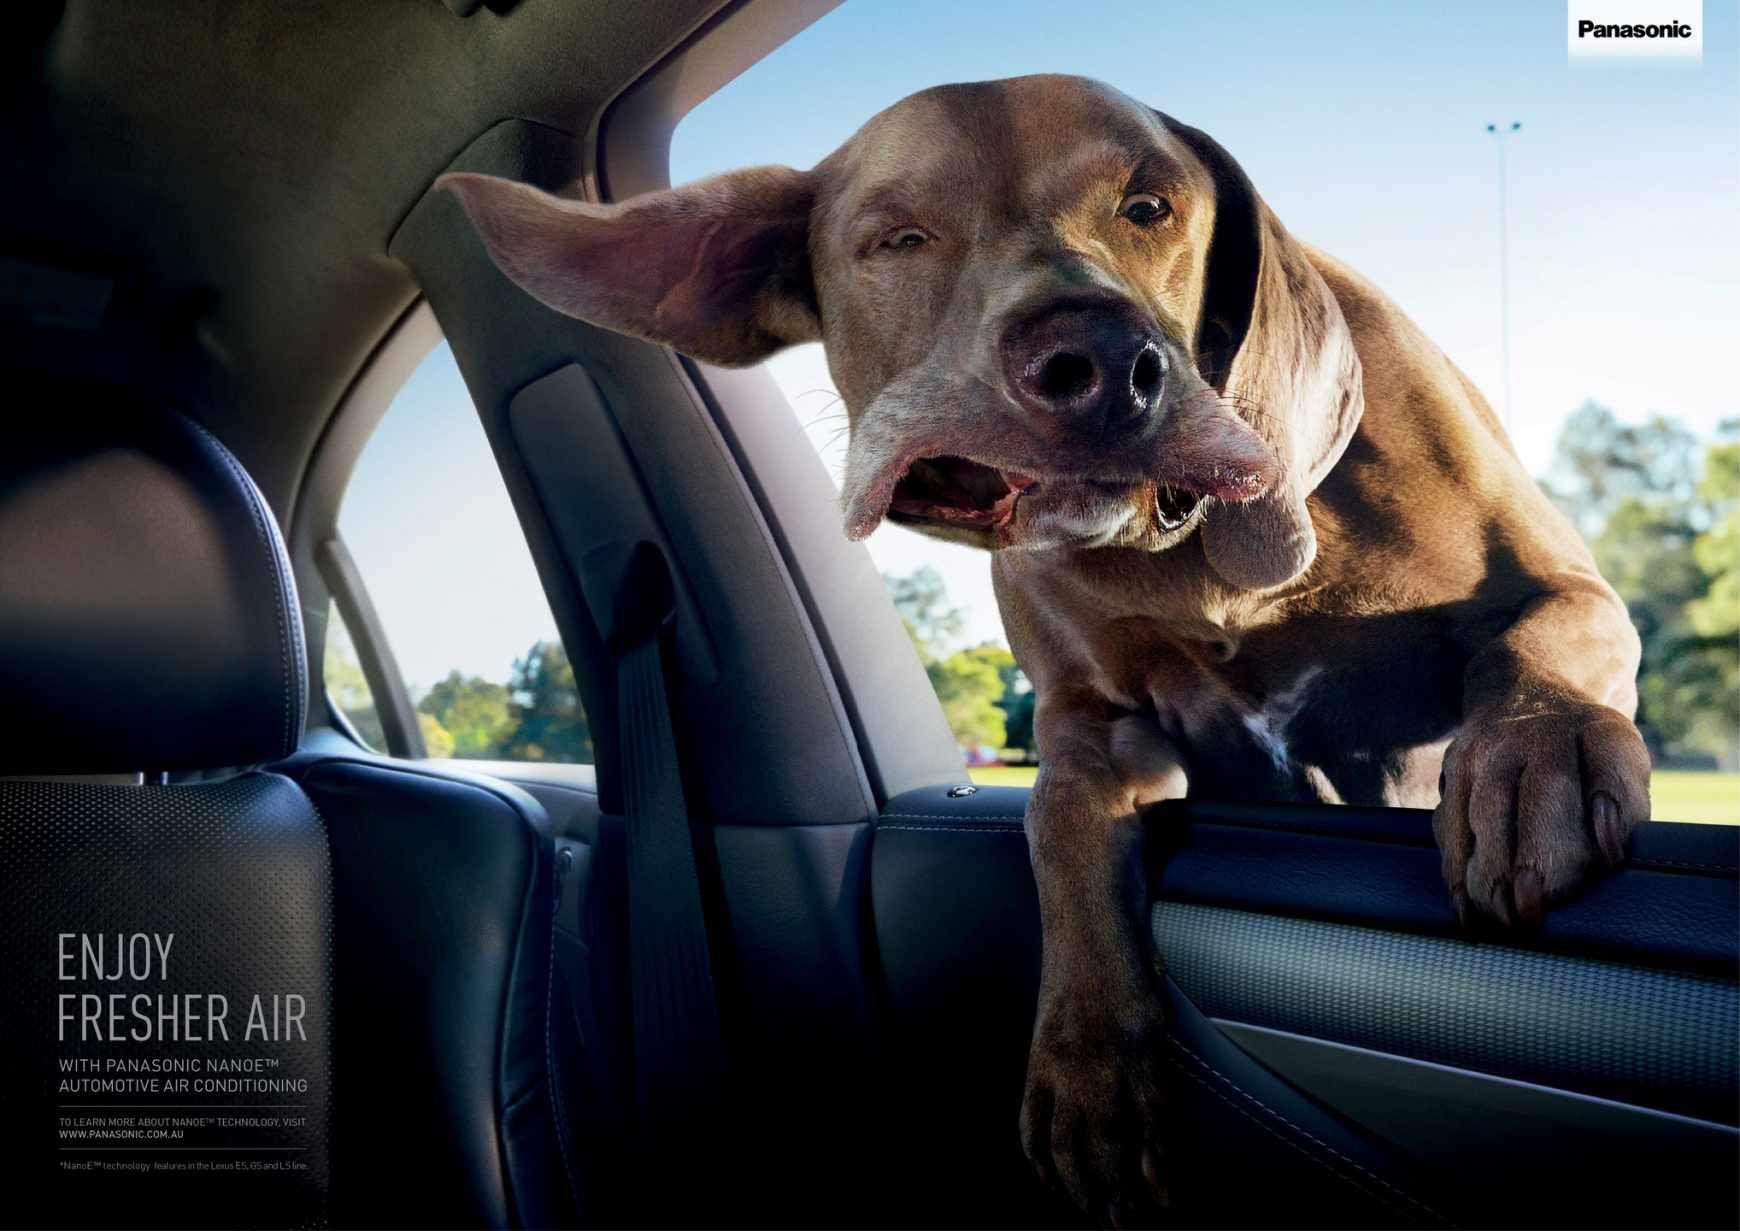 Panasonic Nanoe Automotive Air Conditioning Confused Dog